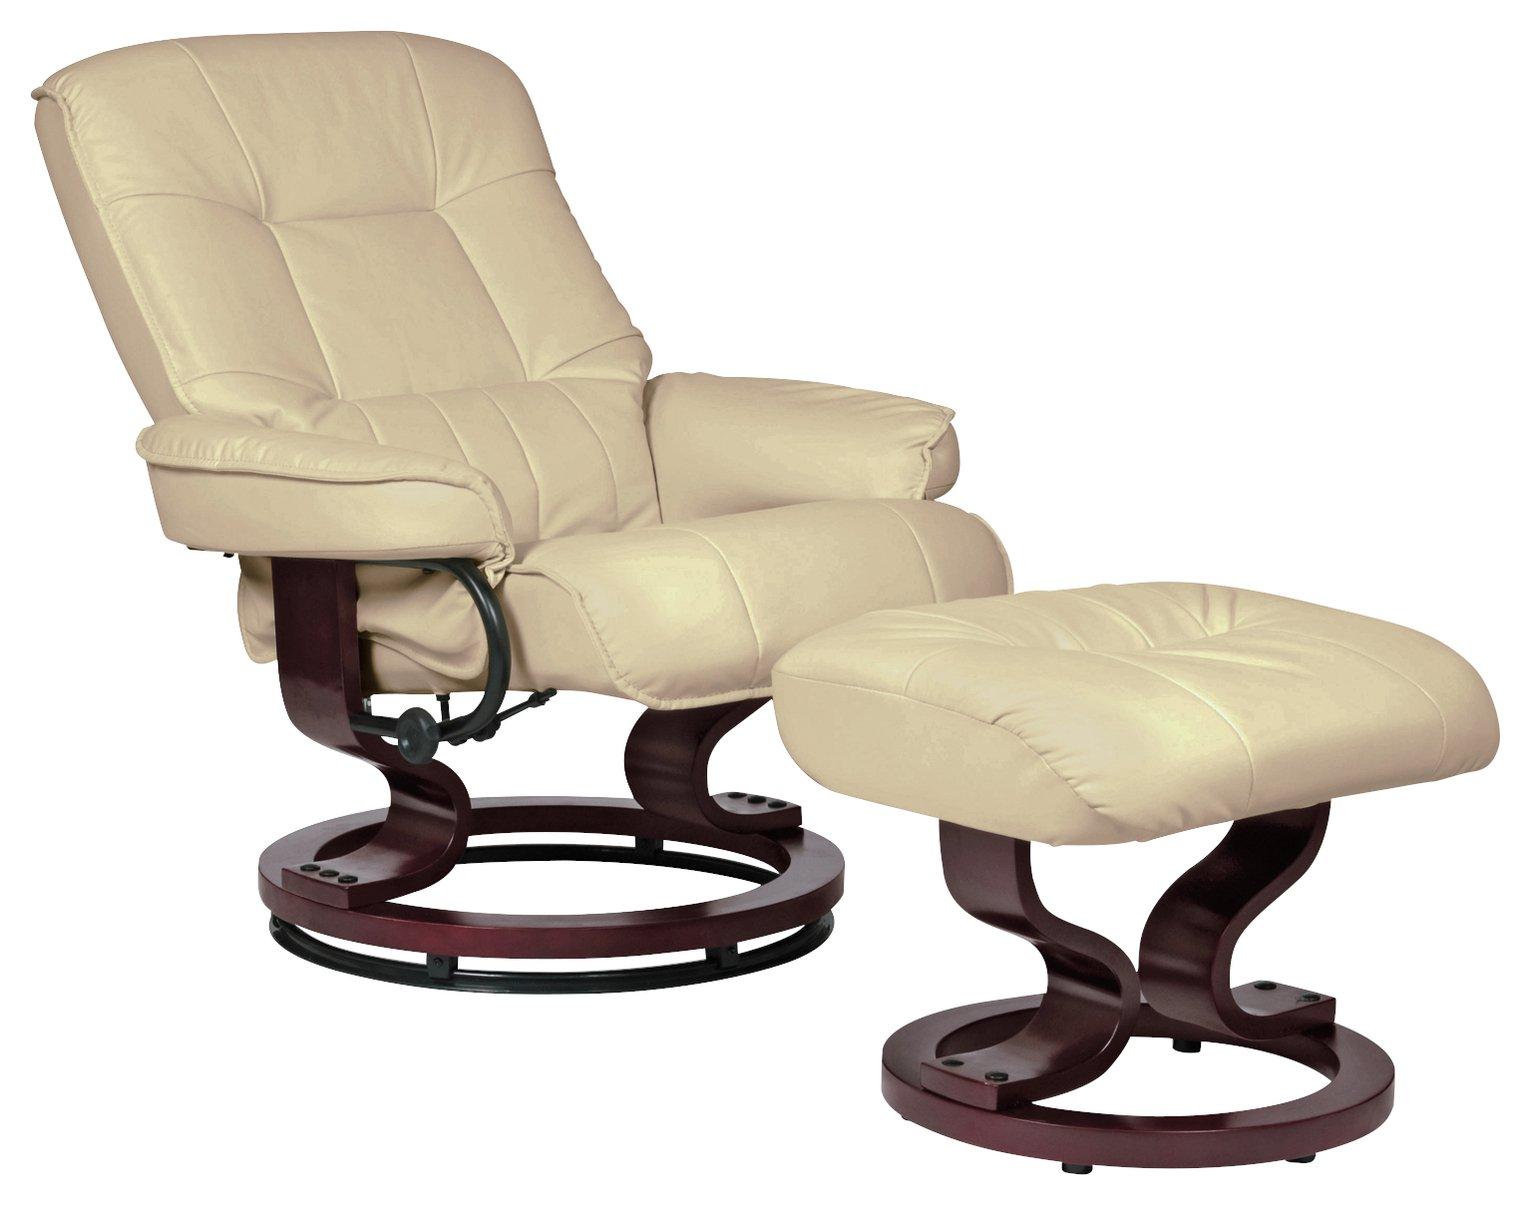 Argos Home Santos Recliner Chair and Footstool Dark Brown